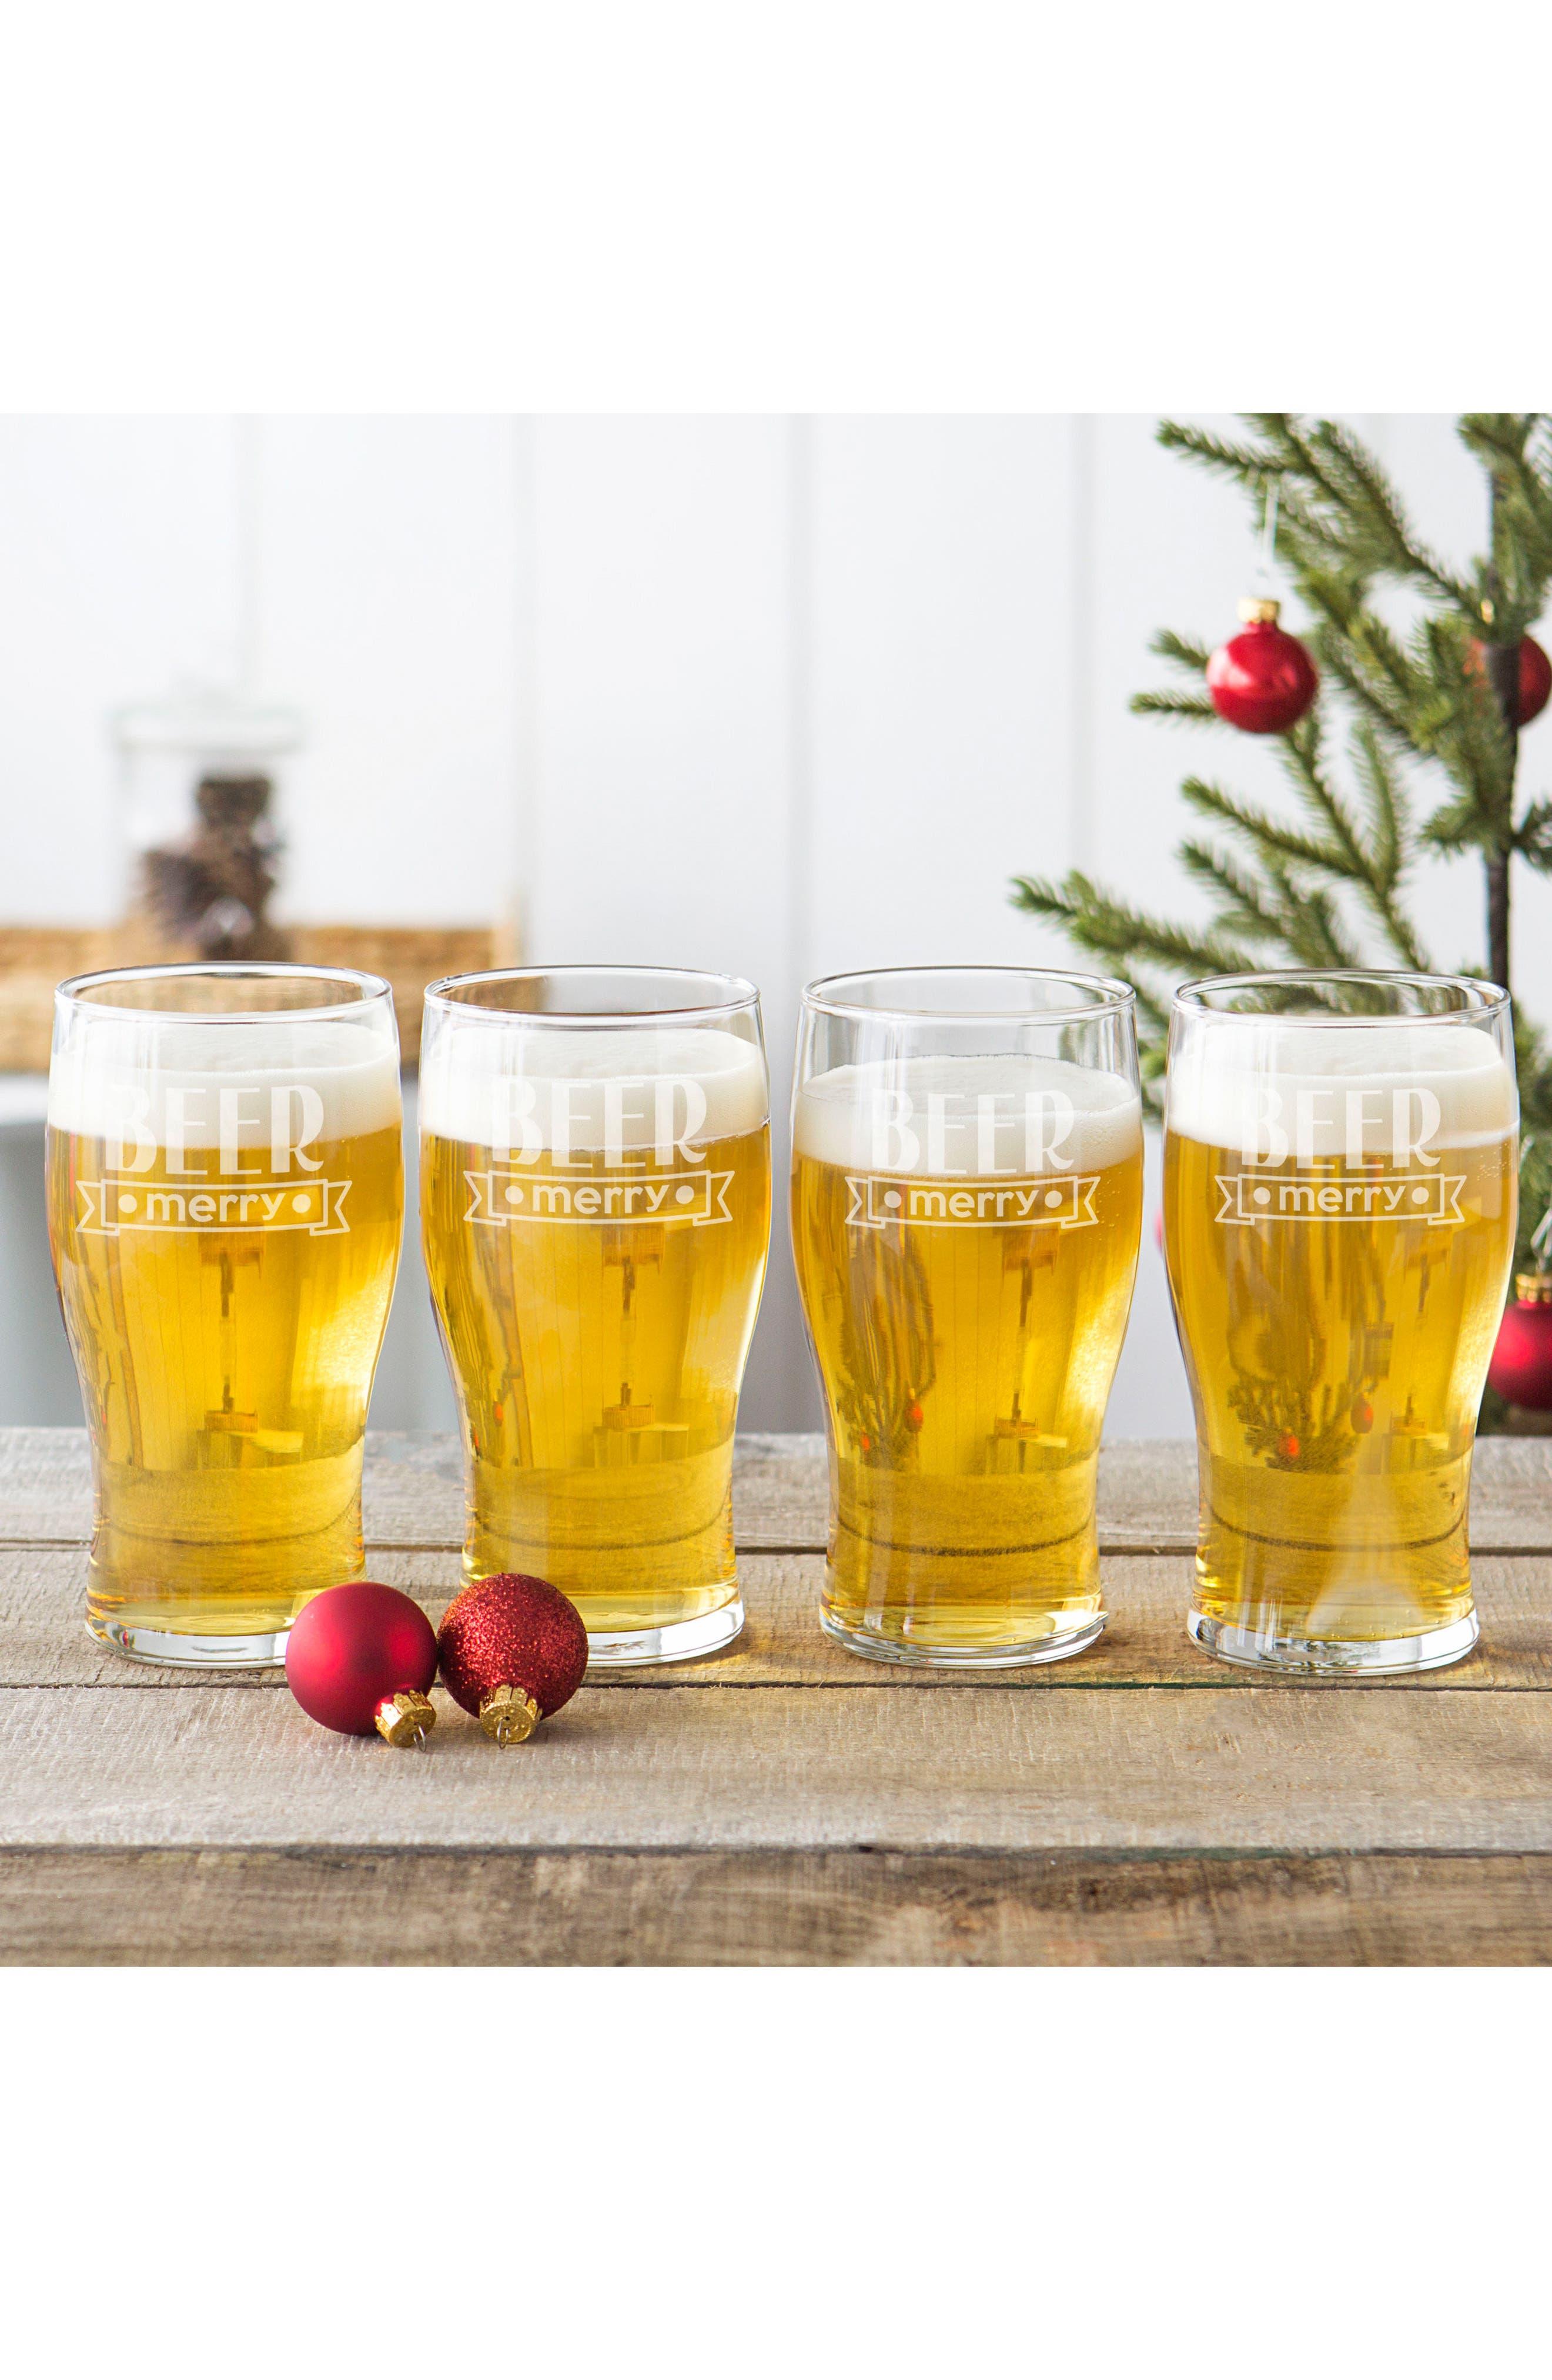 Beer Merry Set of 4 Pilsner Glasses,                             Alternate thumbnail 2, color,                             CLEAR